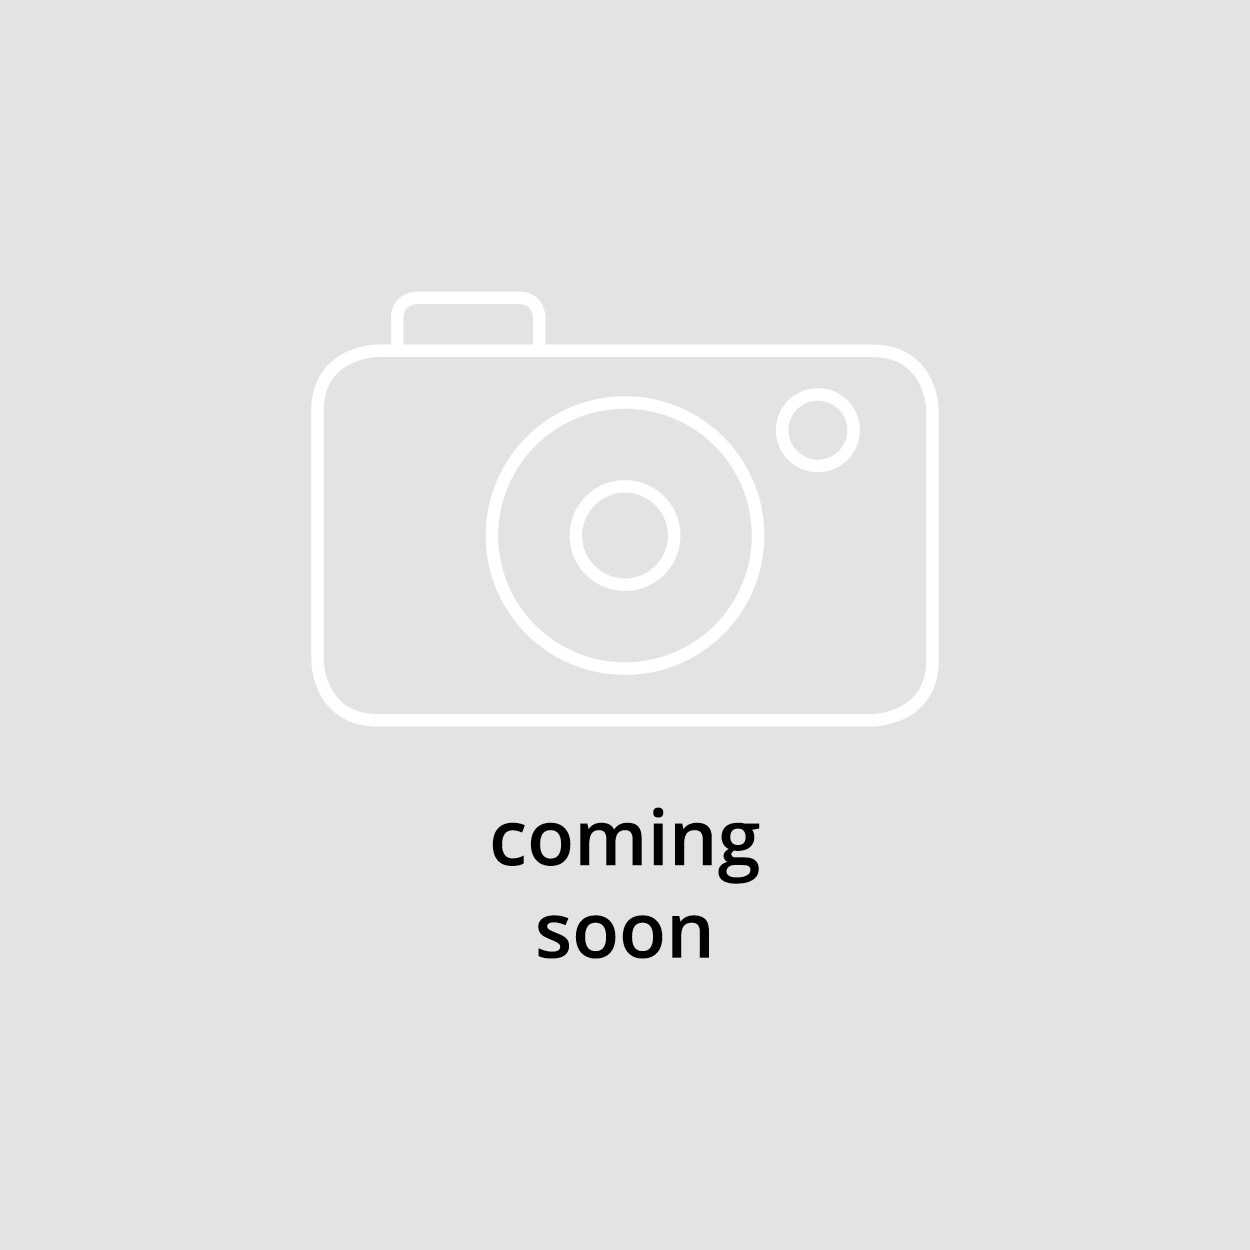 53.34.019 Torretta standard pos. 1-2-3-4-5 per portautensili Gr.1 SST per Gildemeister  GM16AC